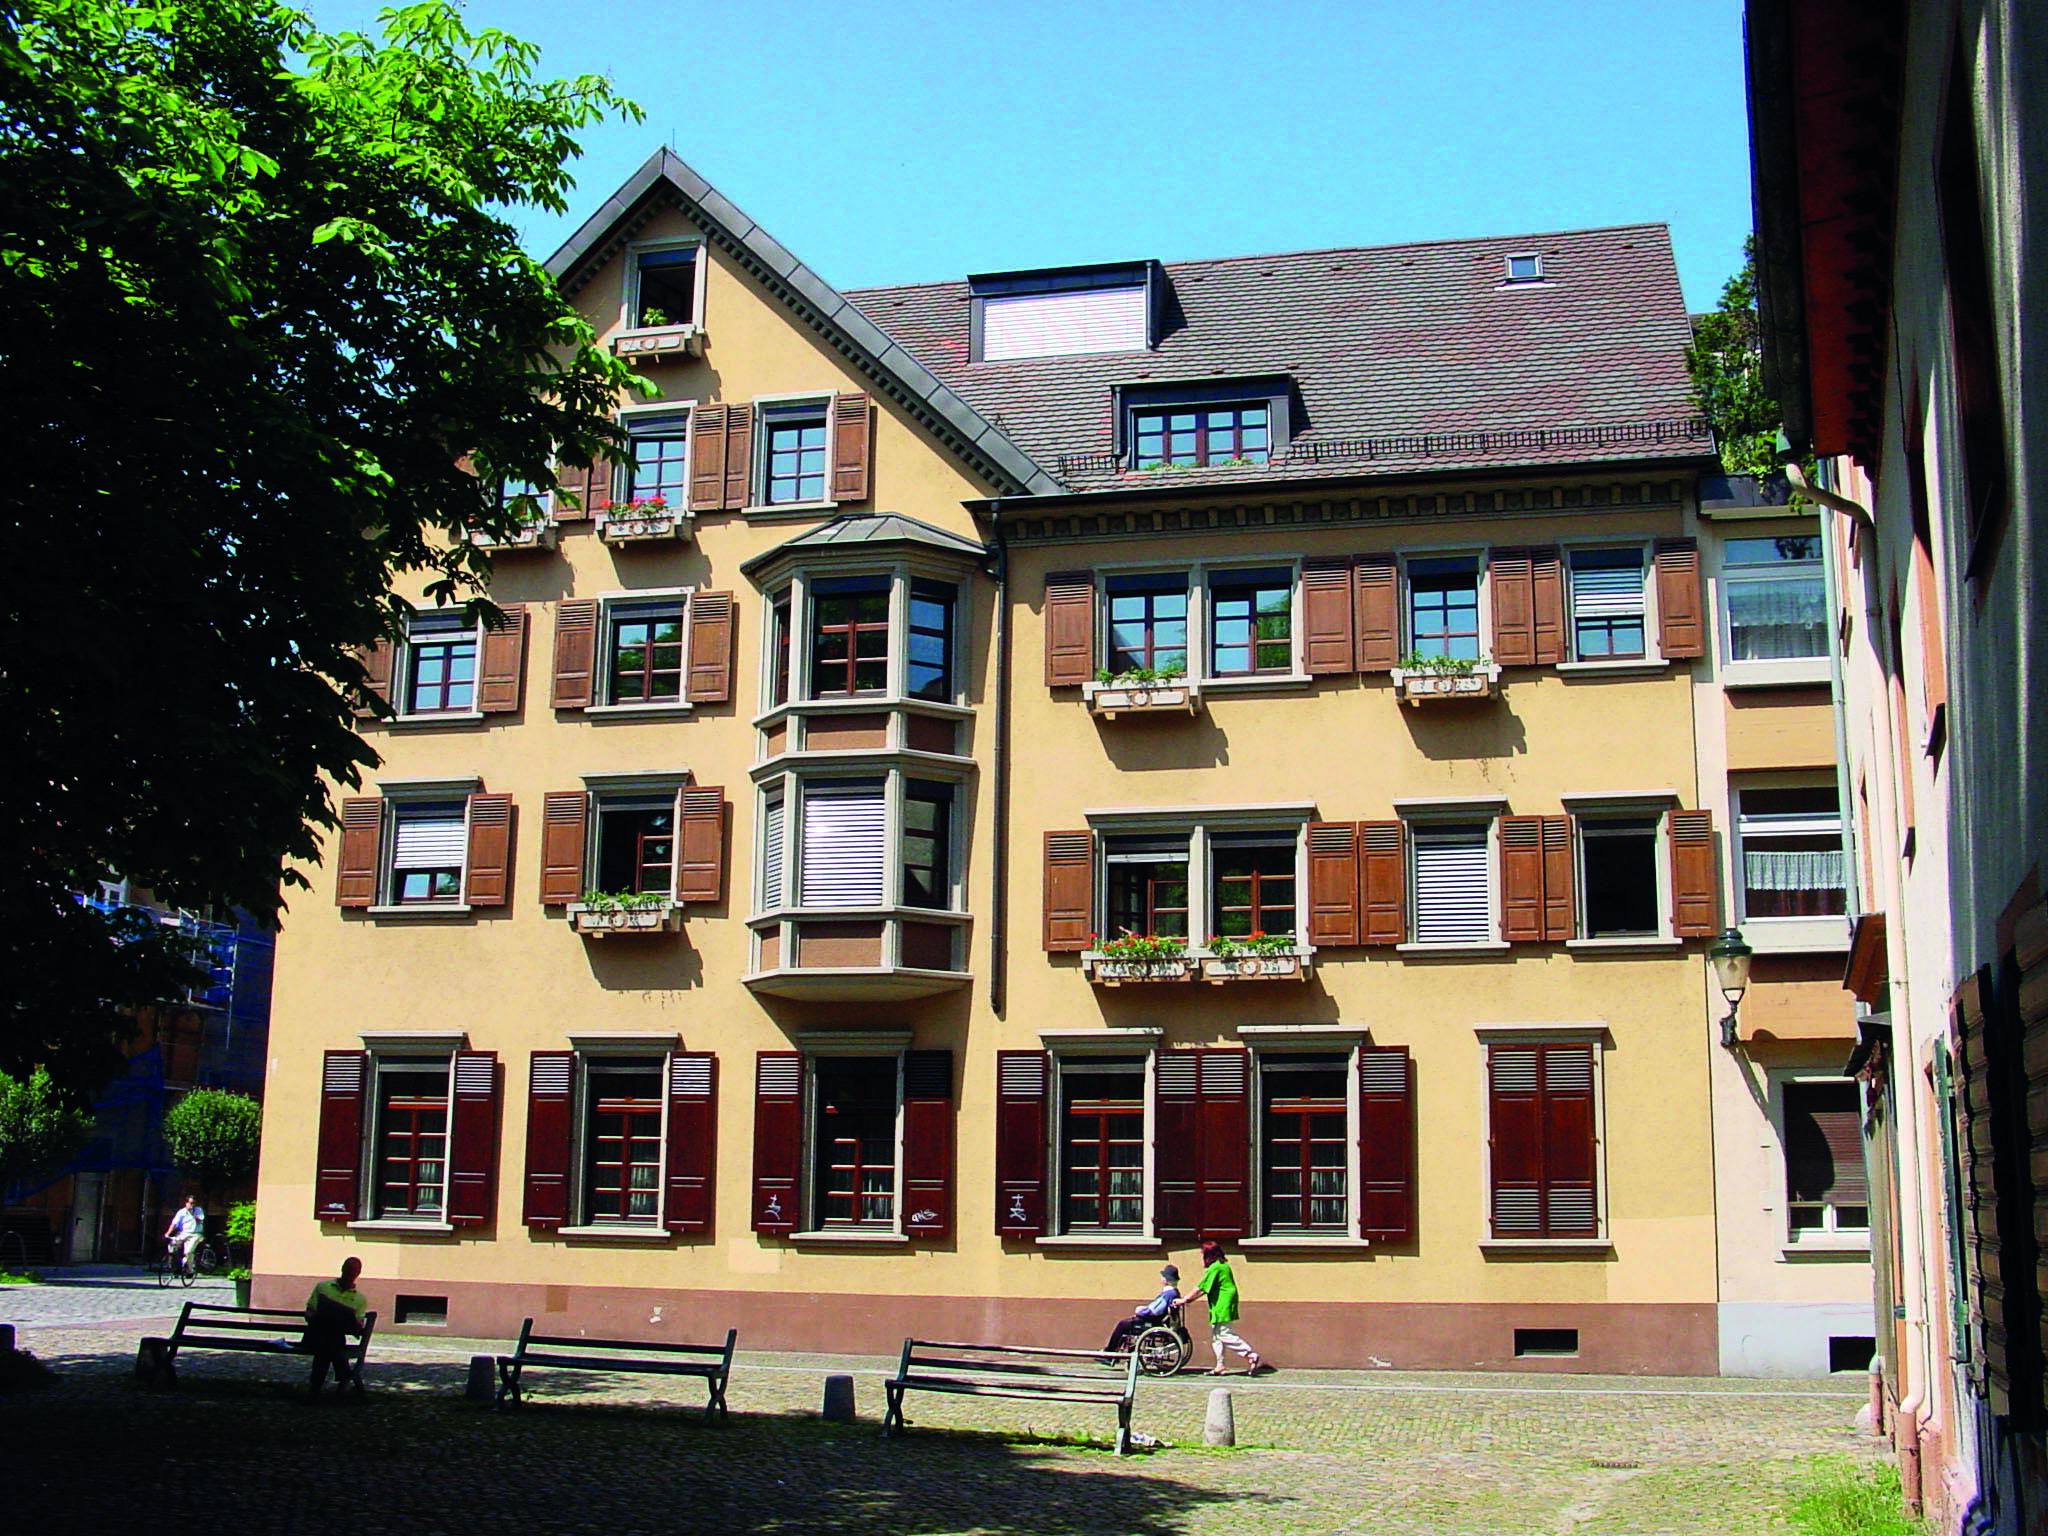 Seniorenpflegeheim Wicherhaus